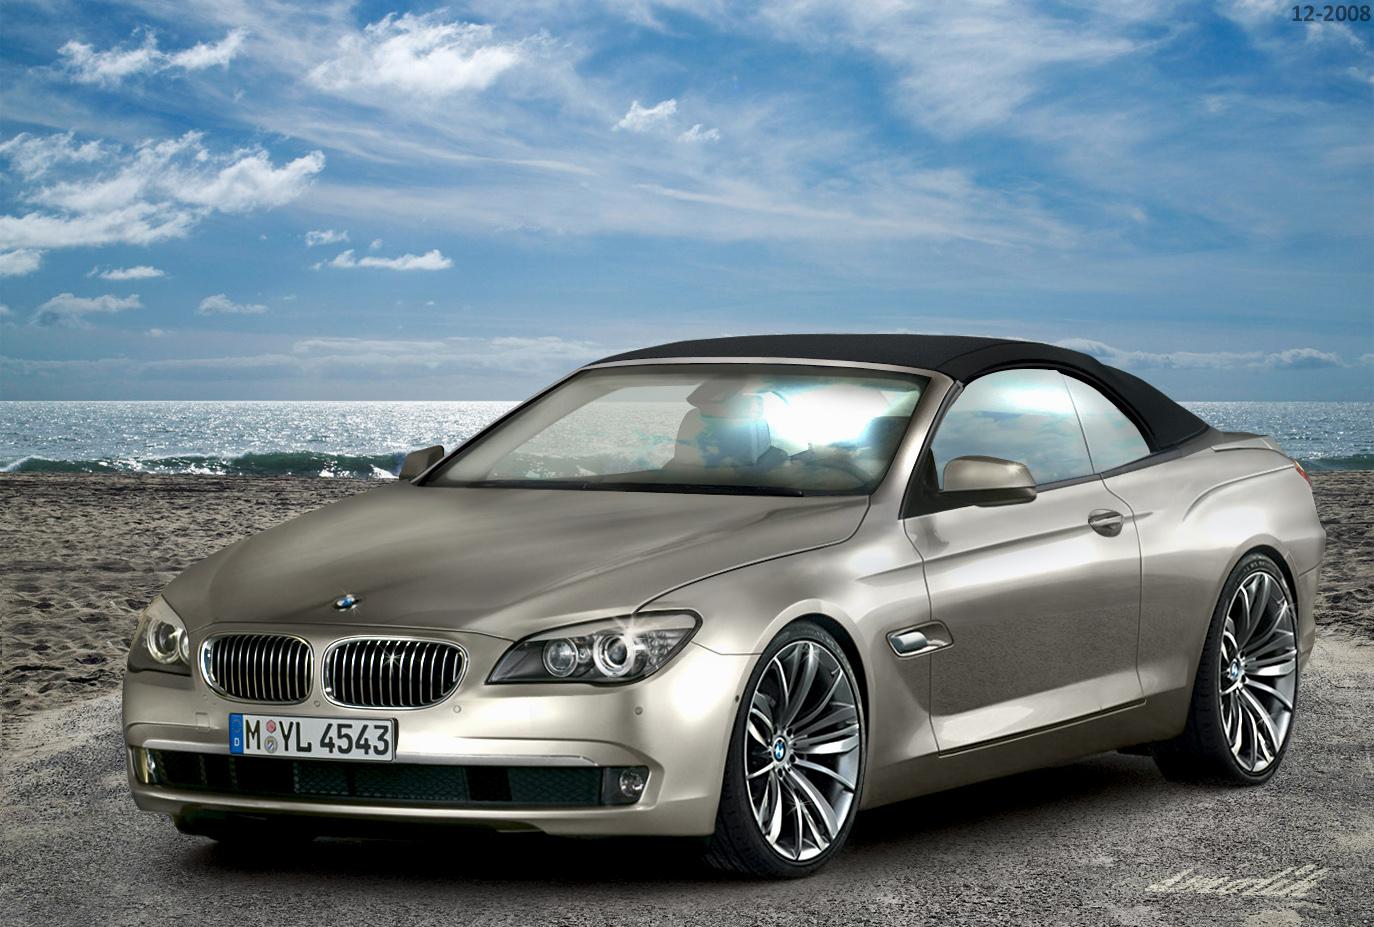 Best Autos Models 2012 Bmw 6 Series